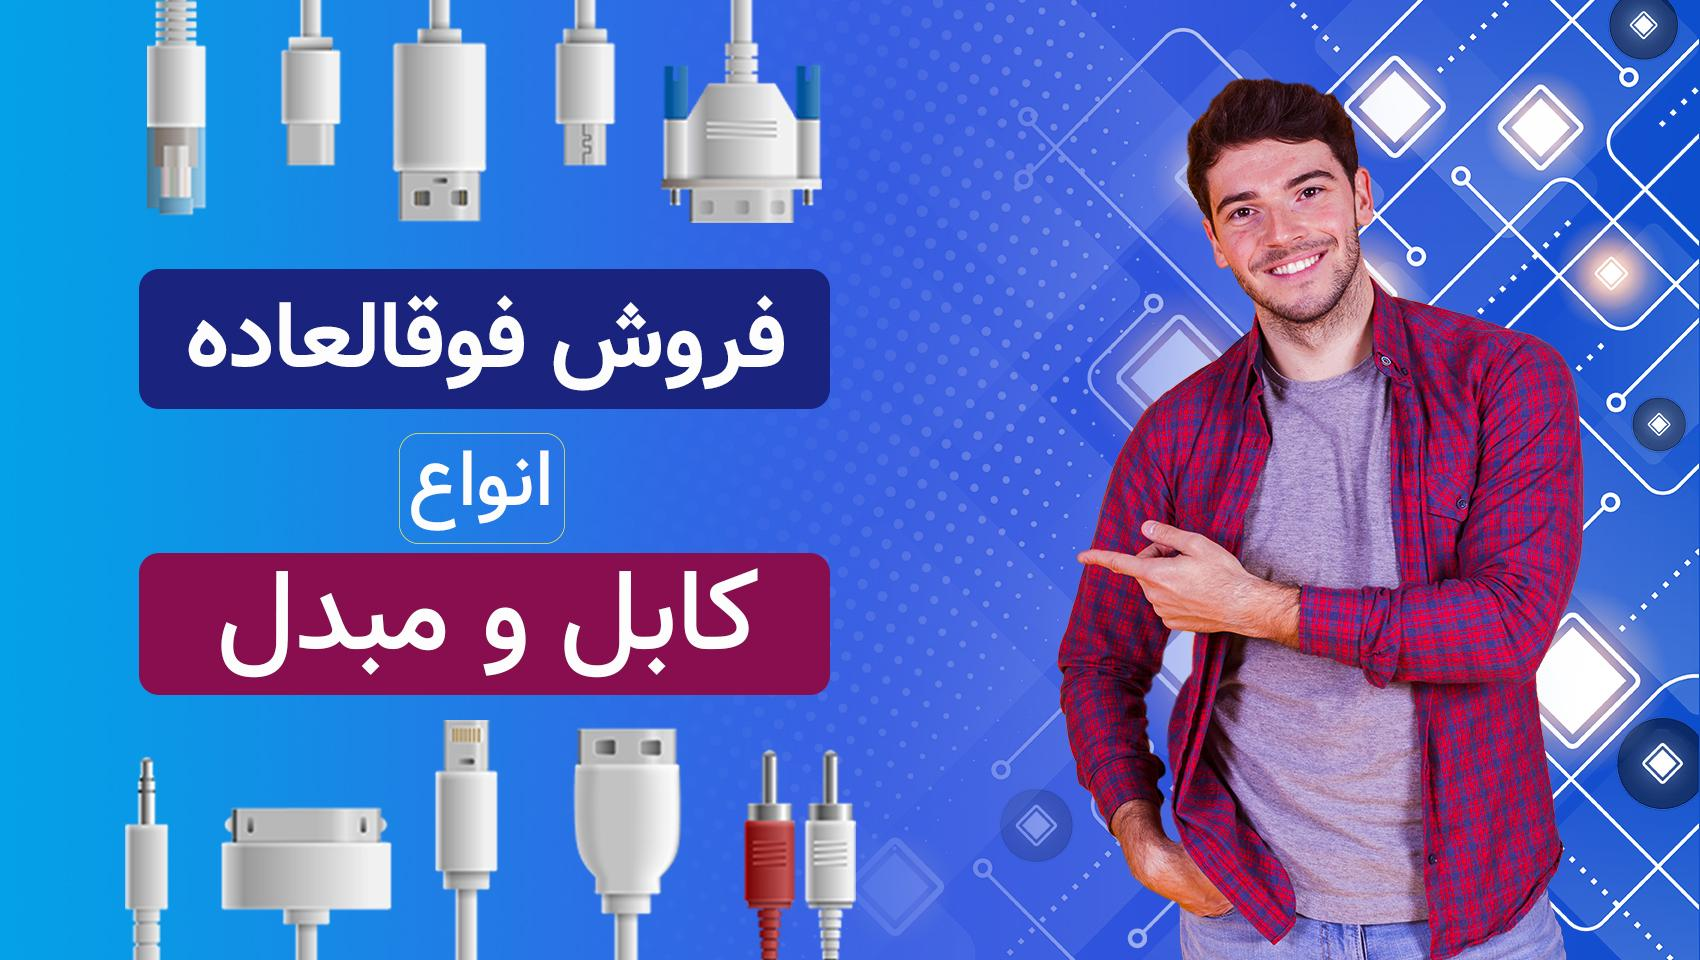 cable behiranpc 1 - فروش کابل و مبدل